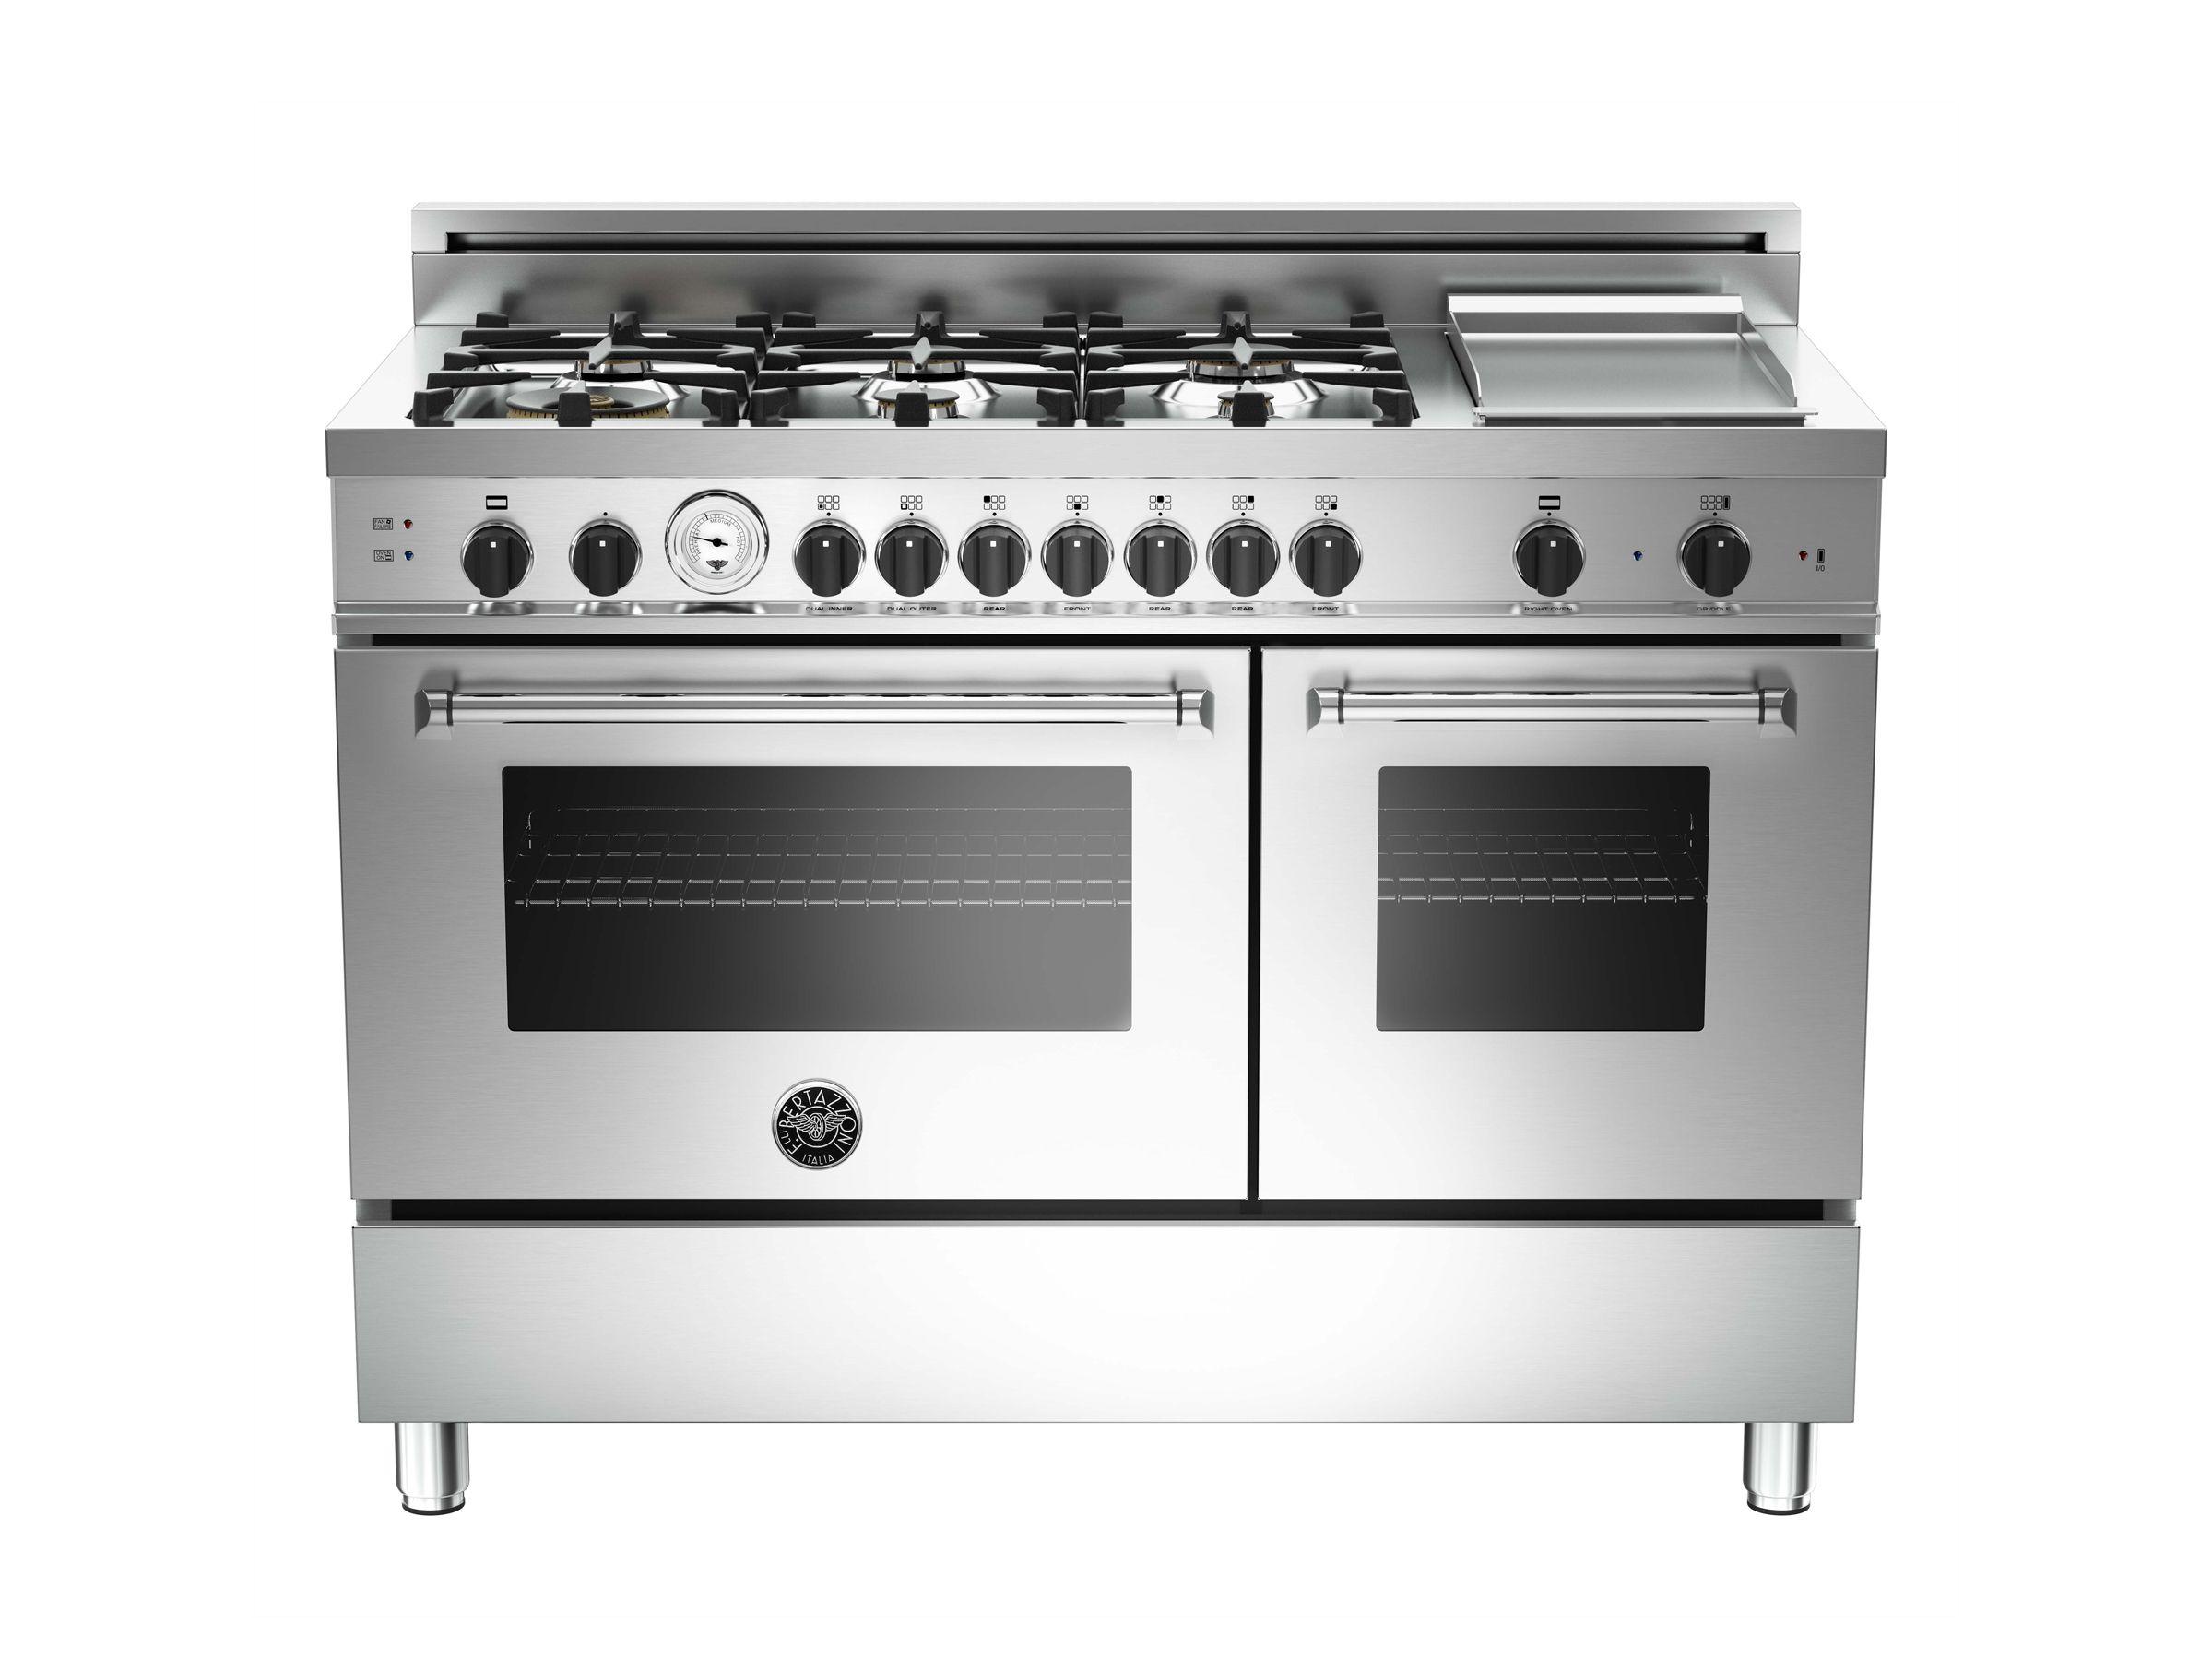 48 6-Burner + Griddle, Gas Double Oven   Bertazzoni   Kitchen ...